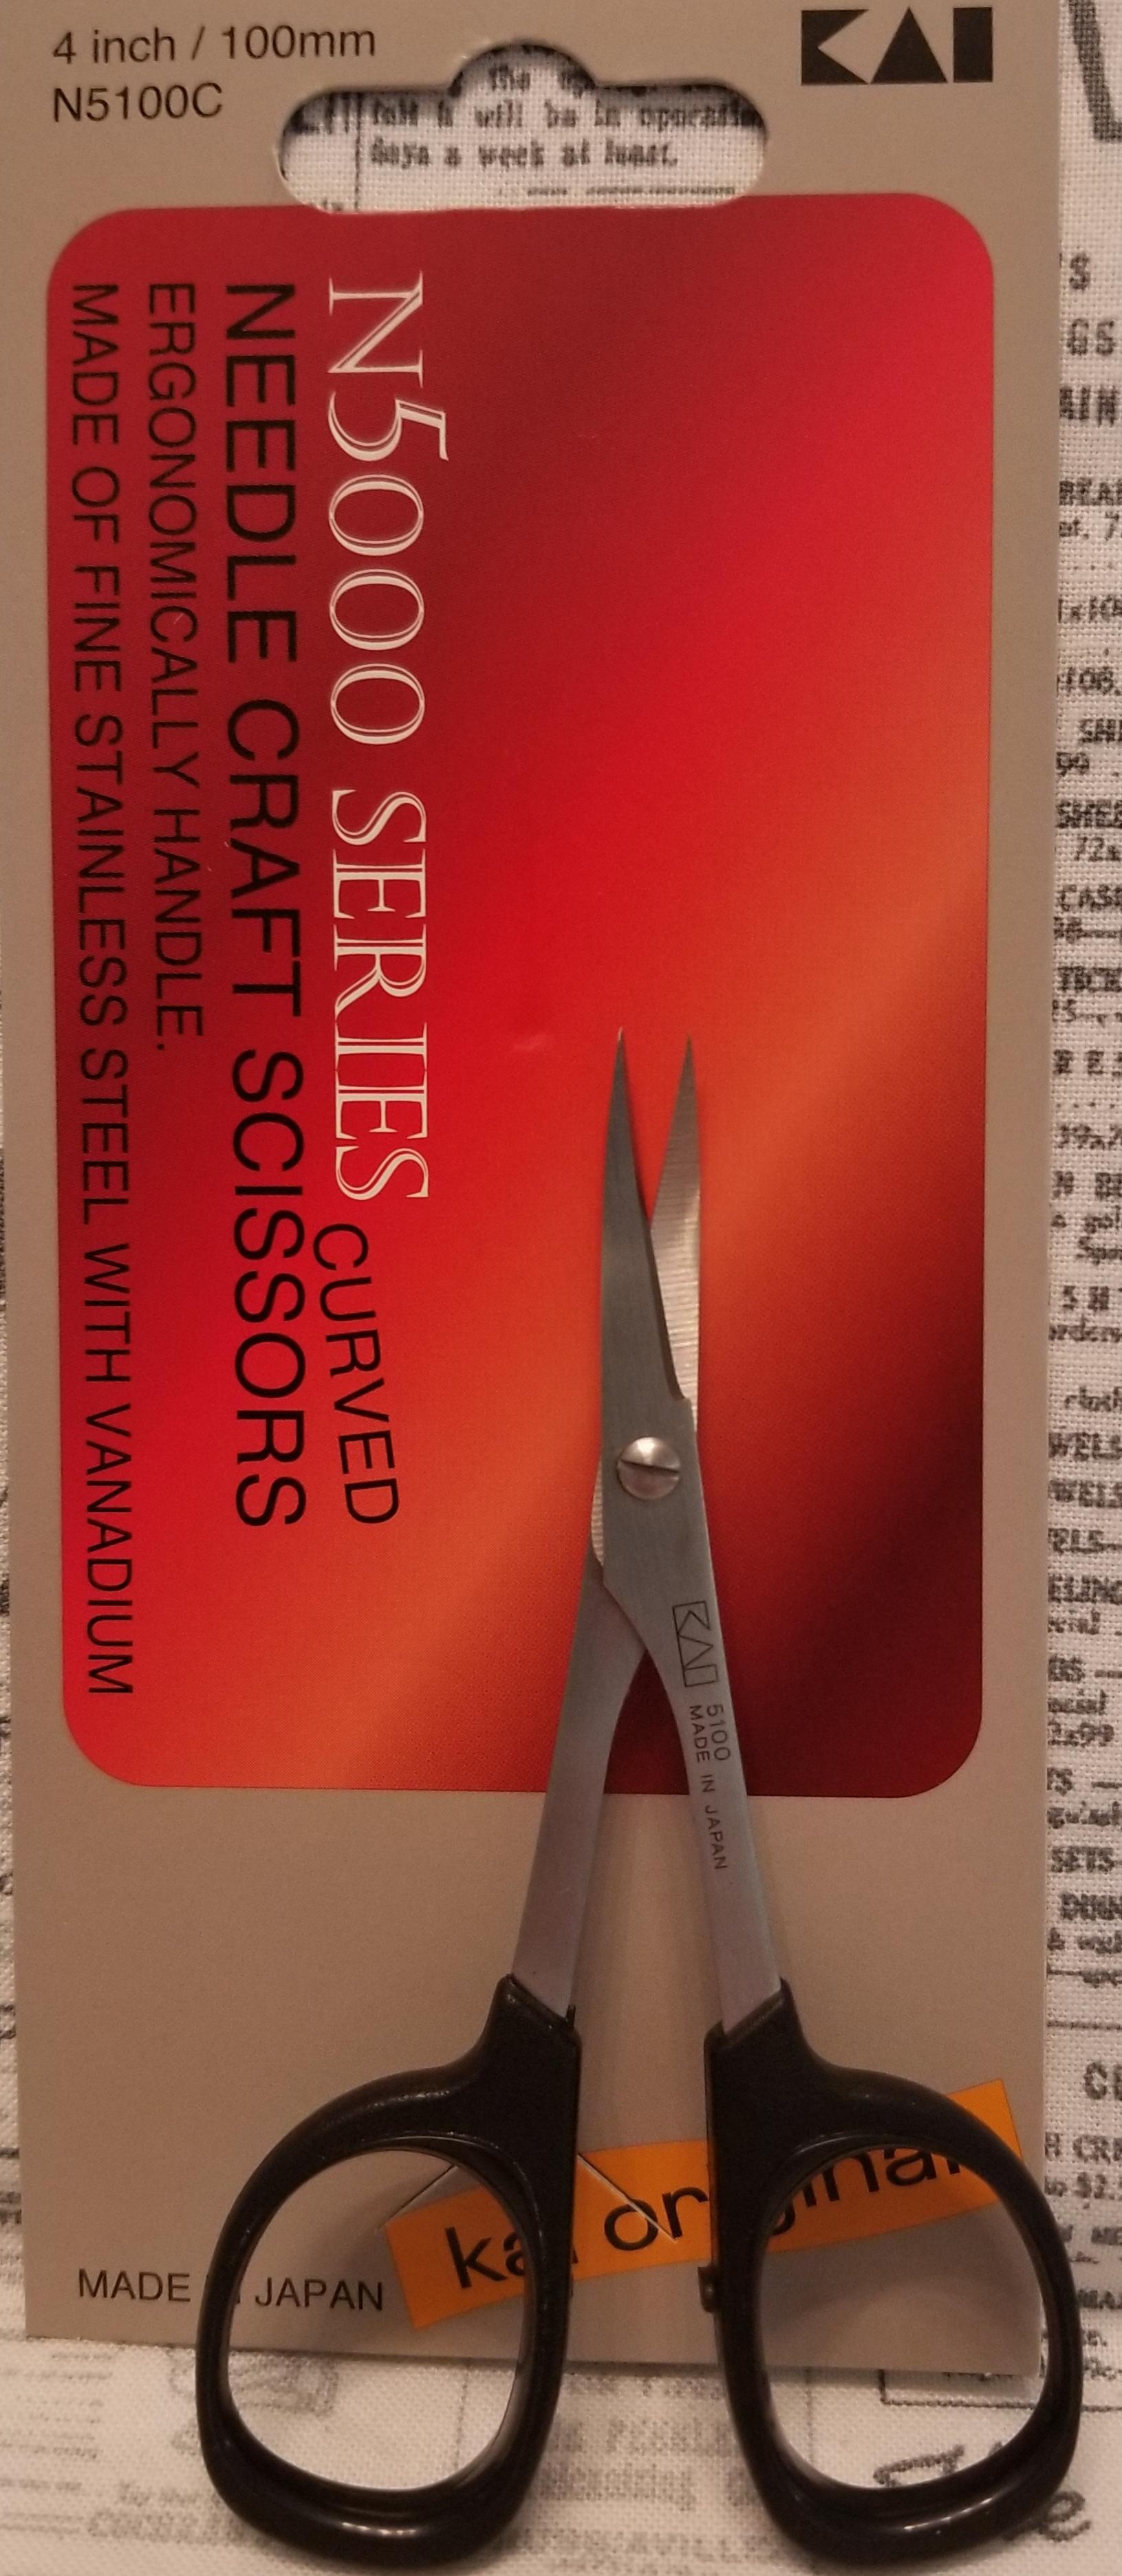 Scissors - 4 - Black - curved blade